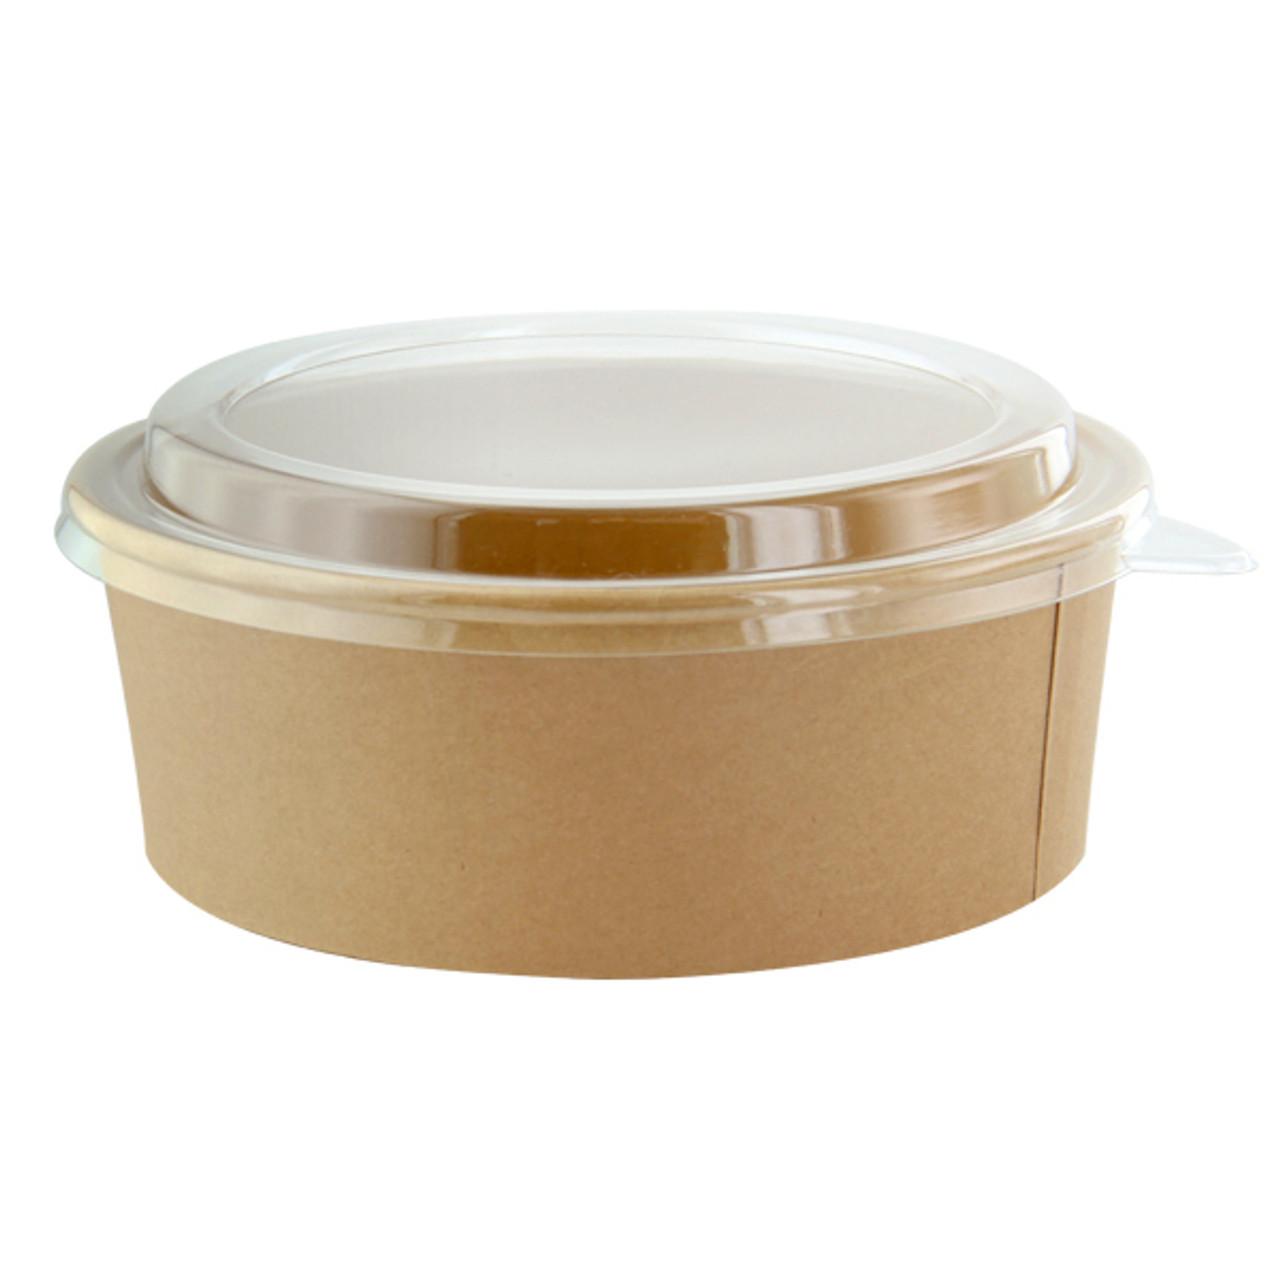 Kraft Paper Salad Bowl (without lid) - 44 oz